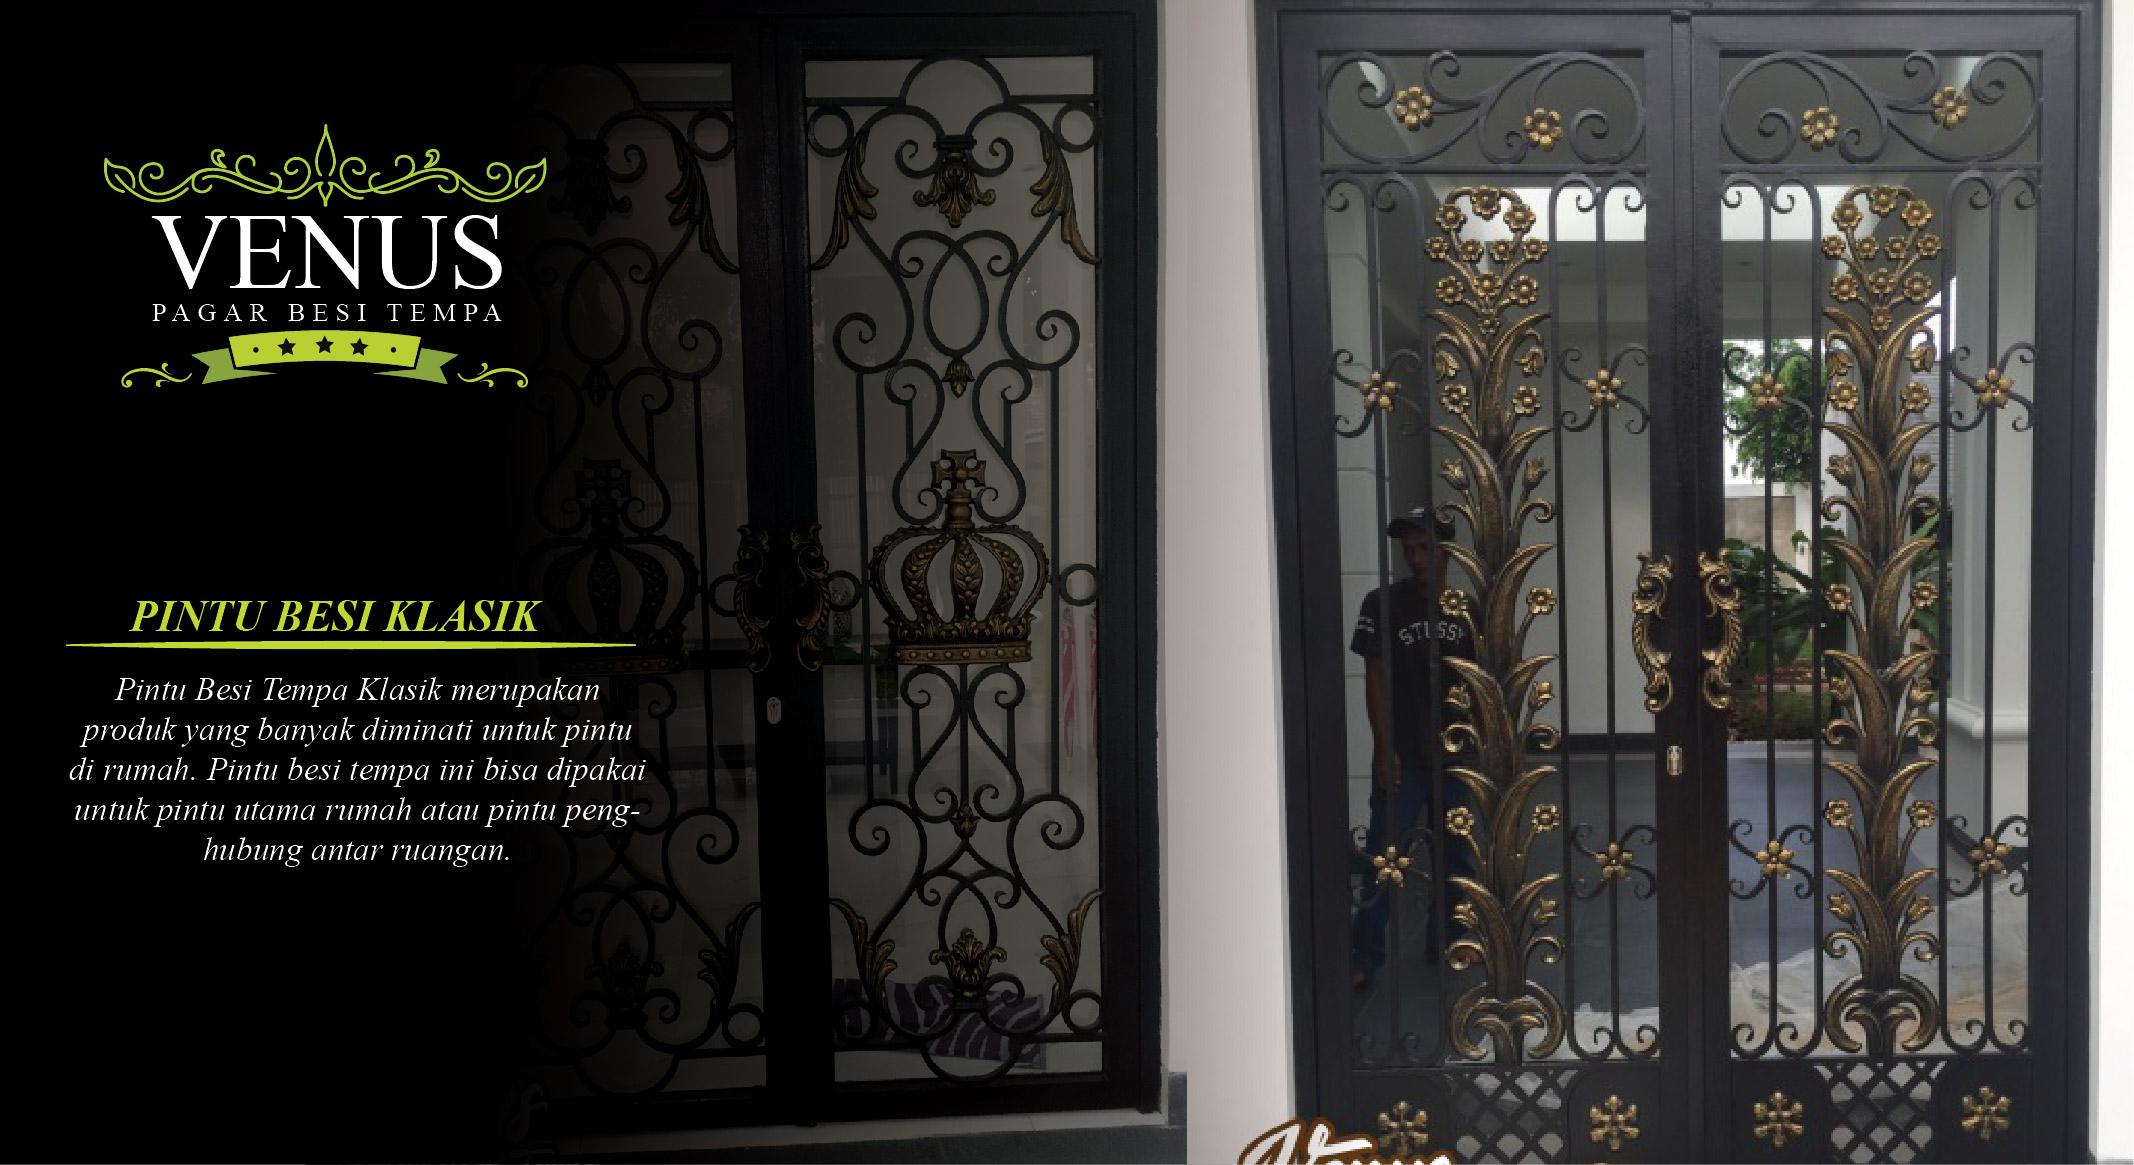 Pintu Besi Tempa Klasik Pintu Besi Klasik Mewah Modern Jakarta